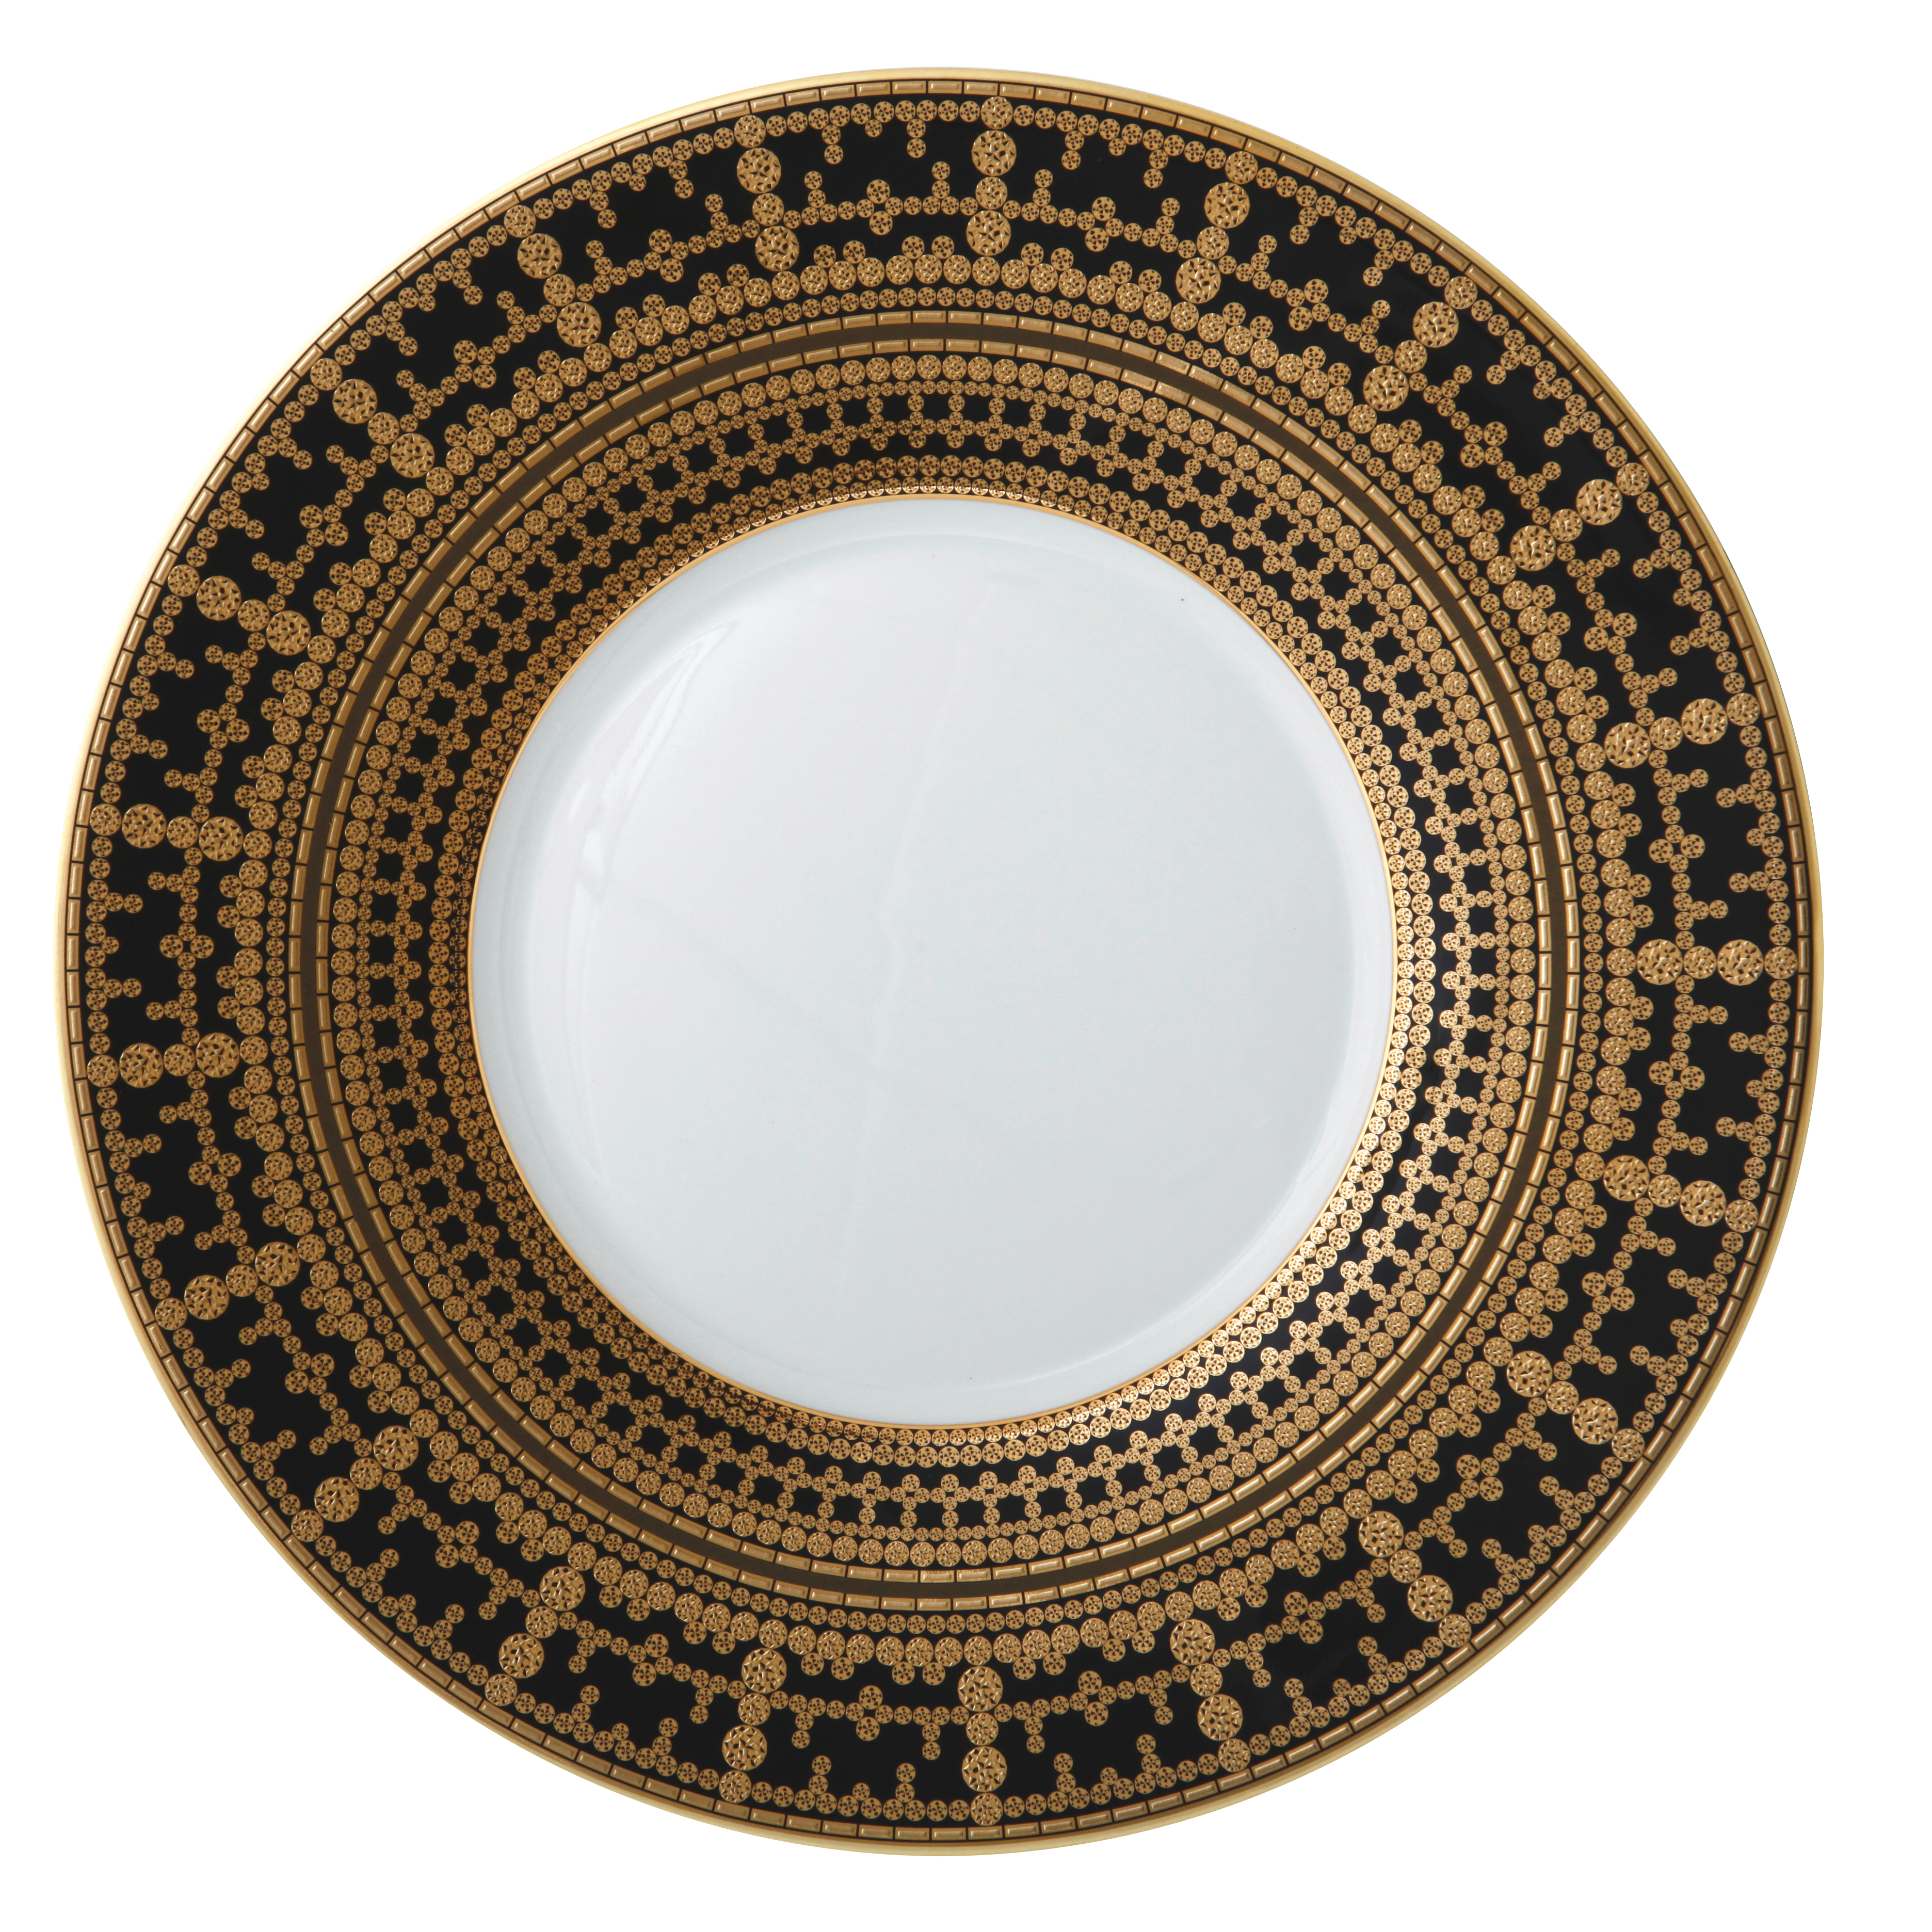 HAVILAND  sc 1 st  Gracious Style & Haviland Tiara Black \u0026 Gold Oblong Cake Platter 15 1/2\